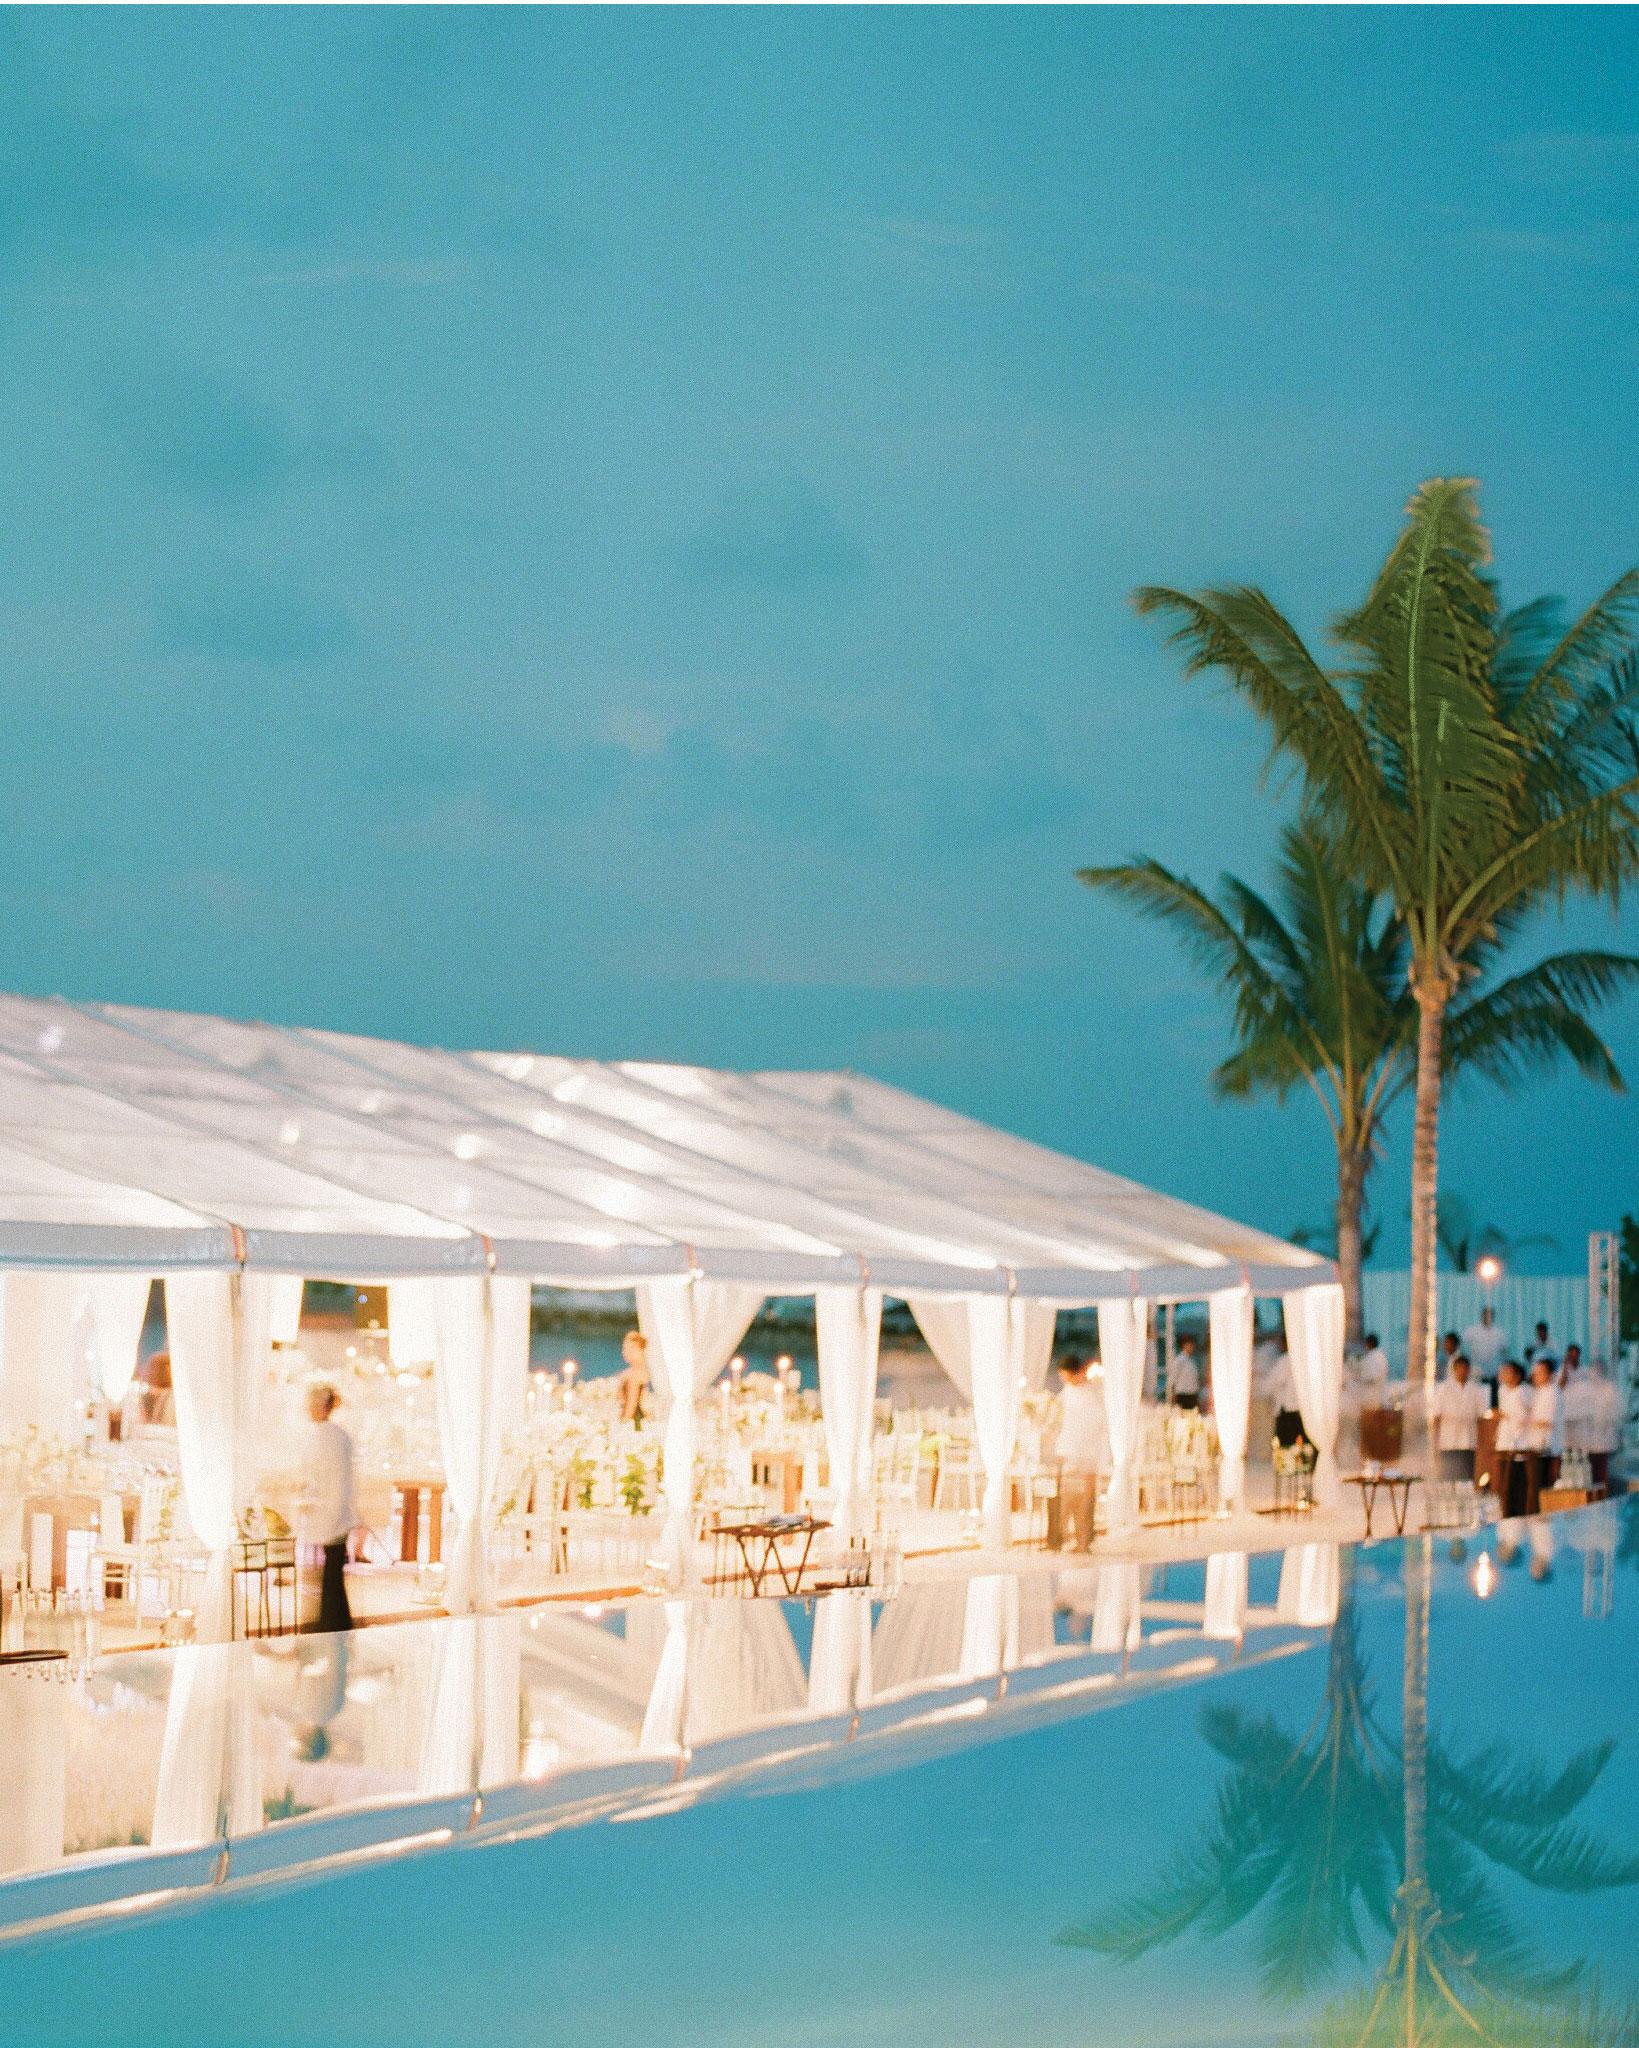 peony-richard-wedding-maldives-reception-tent-on-beach-by-pool-1980-s112383.jpg